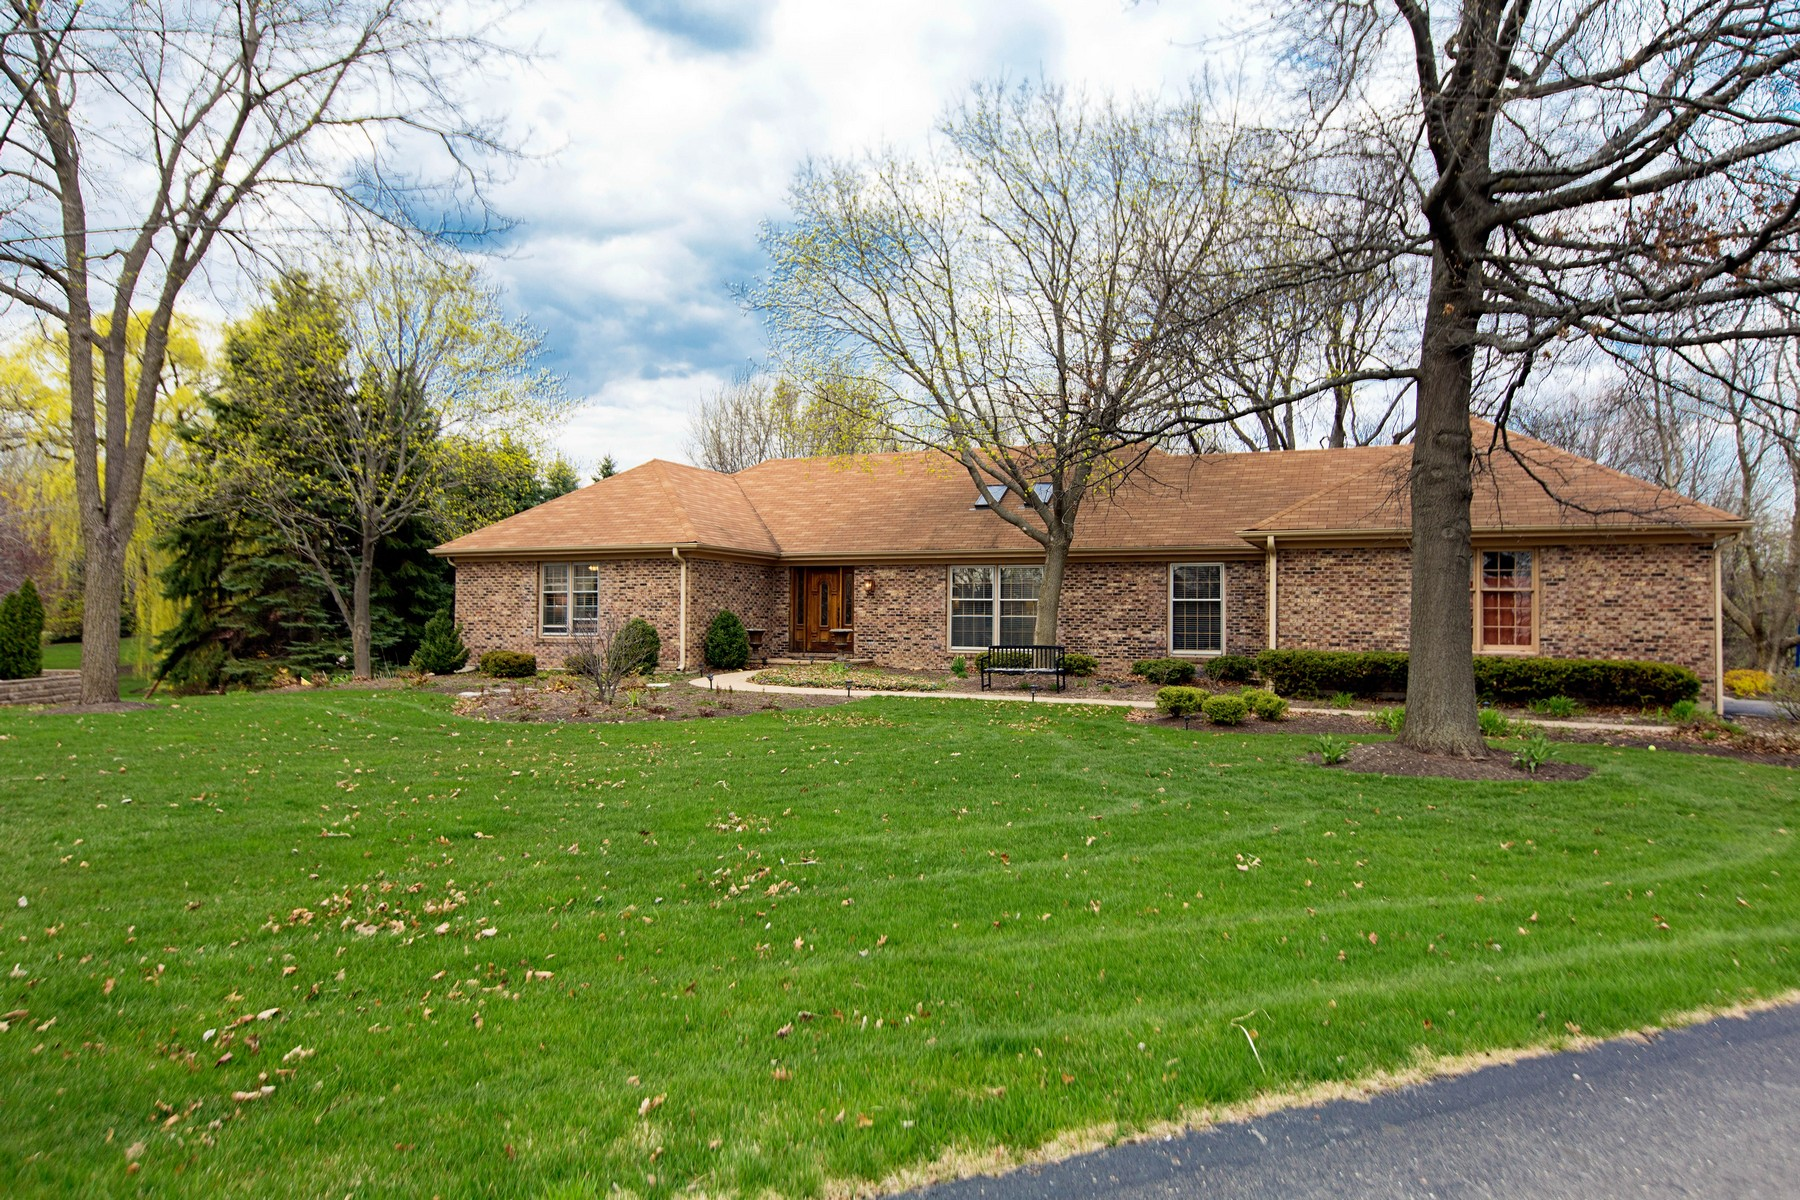 Einfamilienhaus für Verkauf beim Quaint Ranch in The Coves of South Barrington 14 Turning Shore Drive South Barrington, Illinois, 60010 Vereinigte Staaten